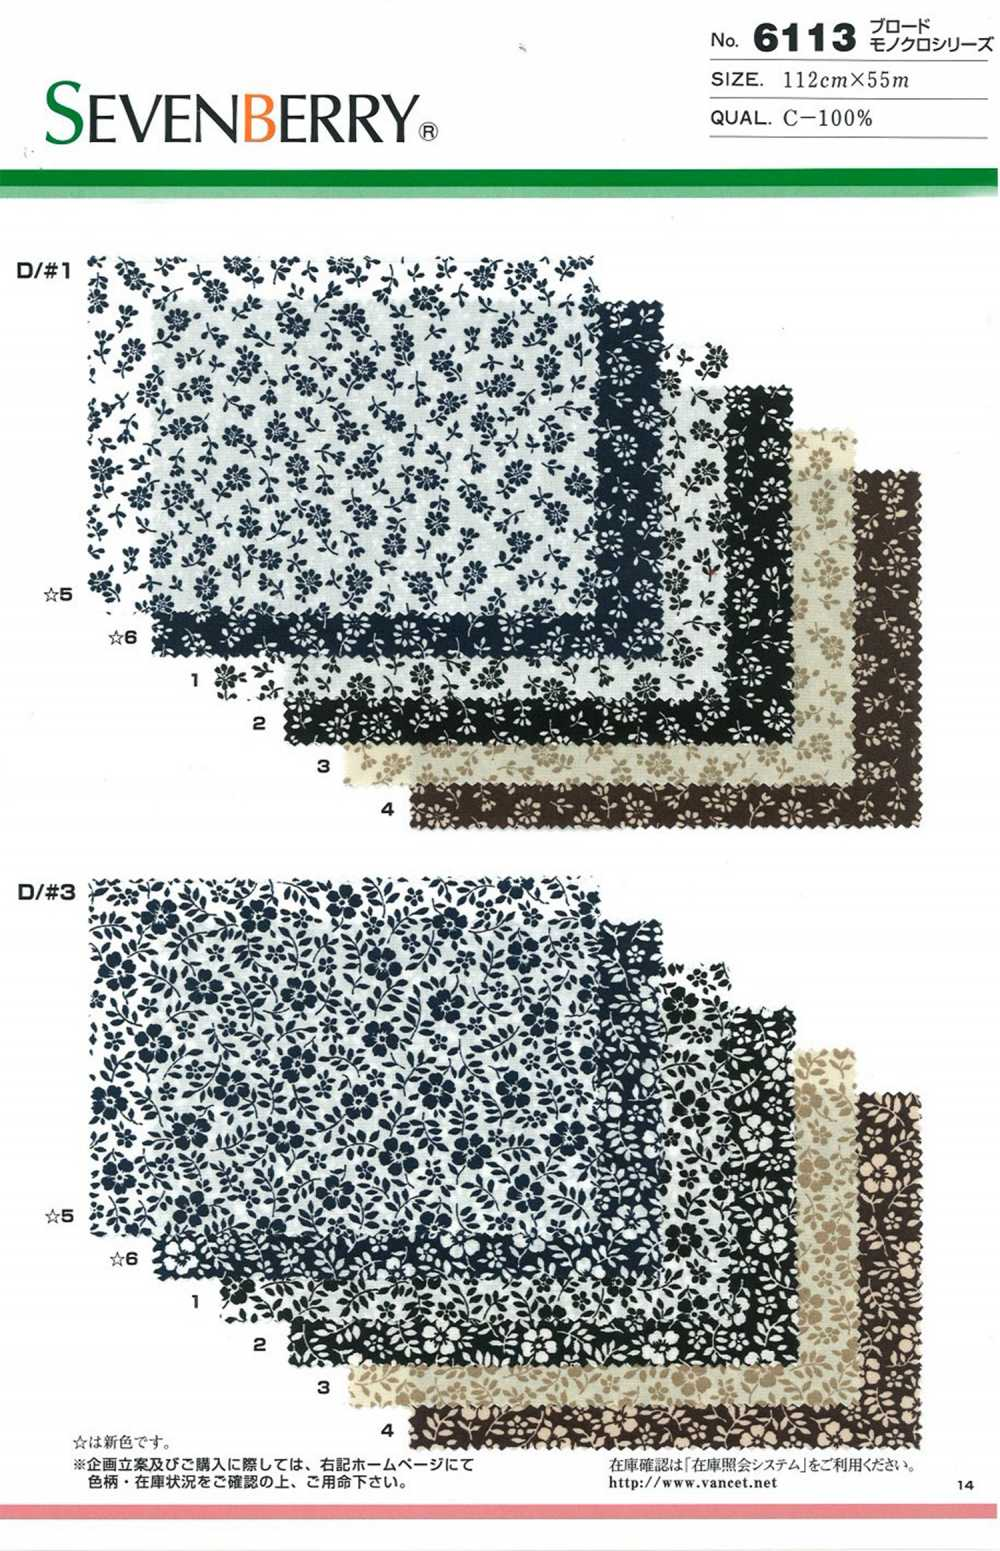 6113 SEVENBERRY ブロード モノクロシリーズ[生地] VANCET/オークラ商事 - ApparelX アパレル資材卸通販